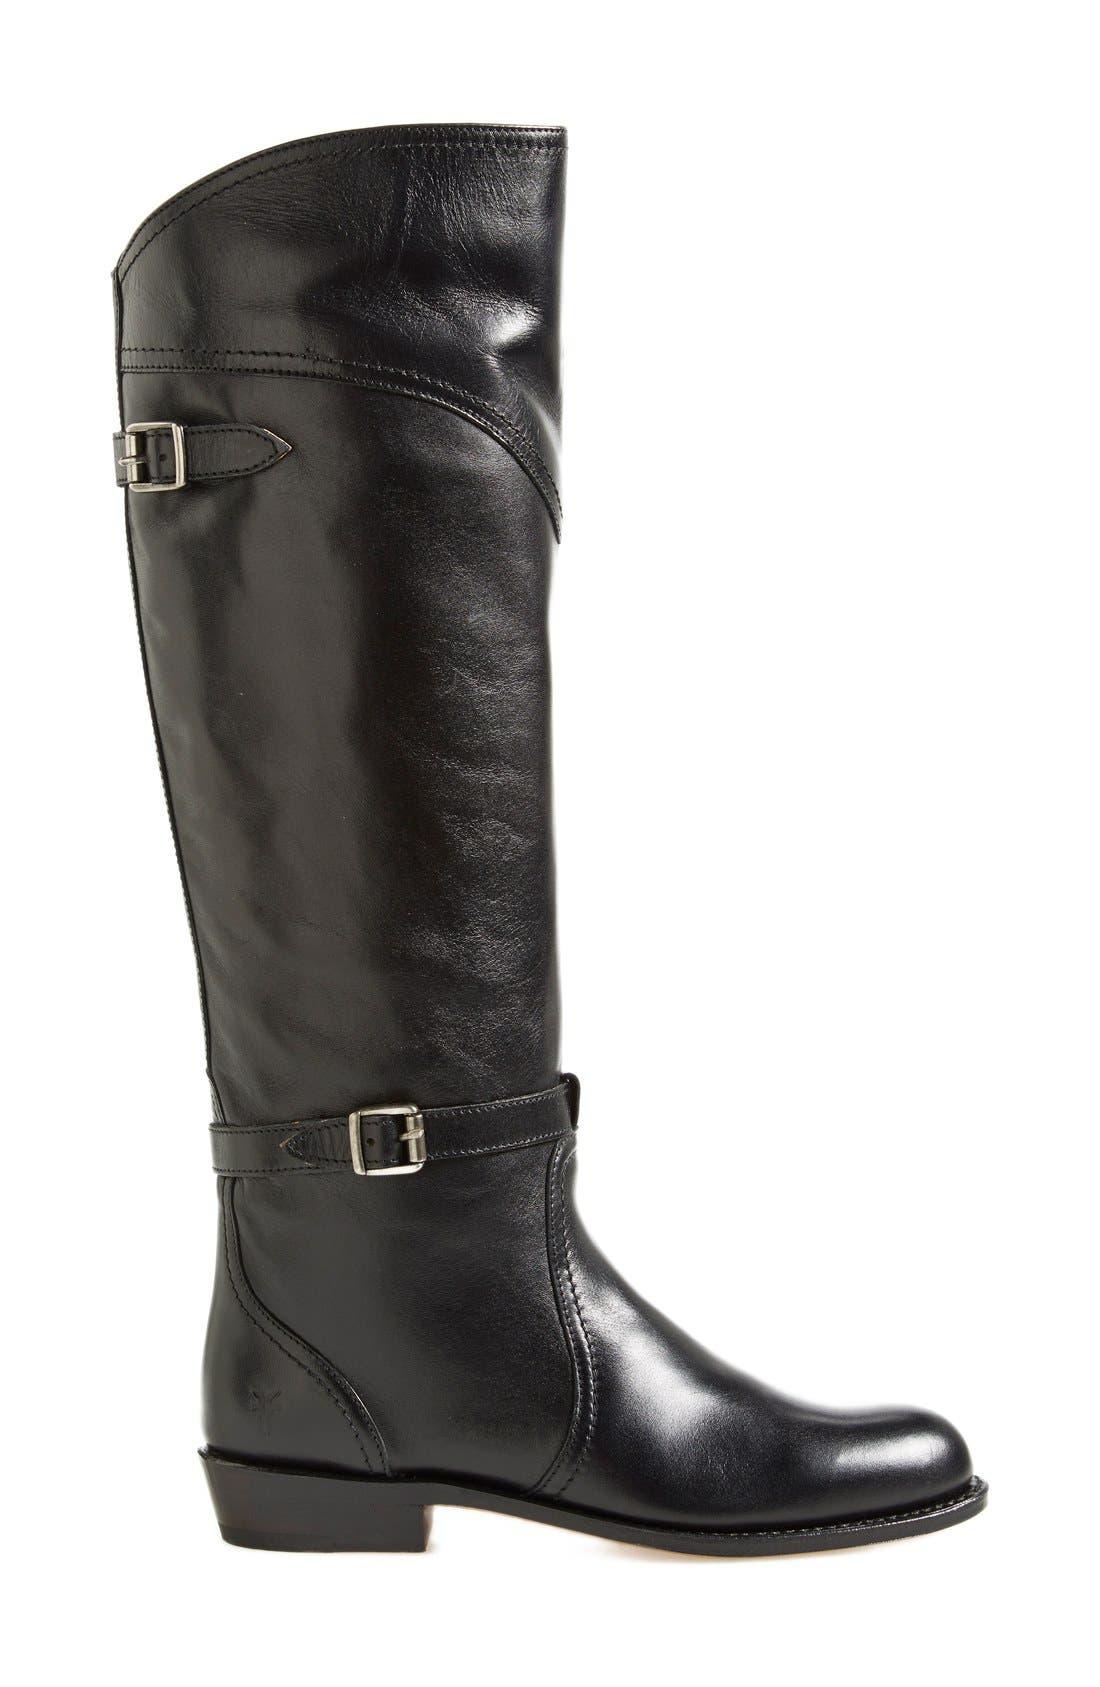 Main Image - Frye 'Dorado' Leather Riding Boot